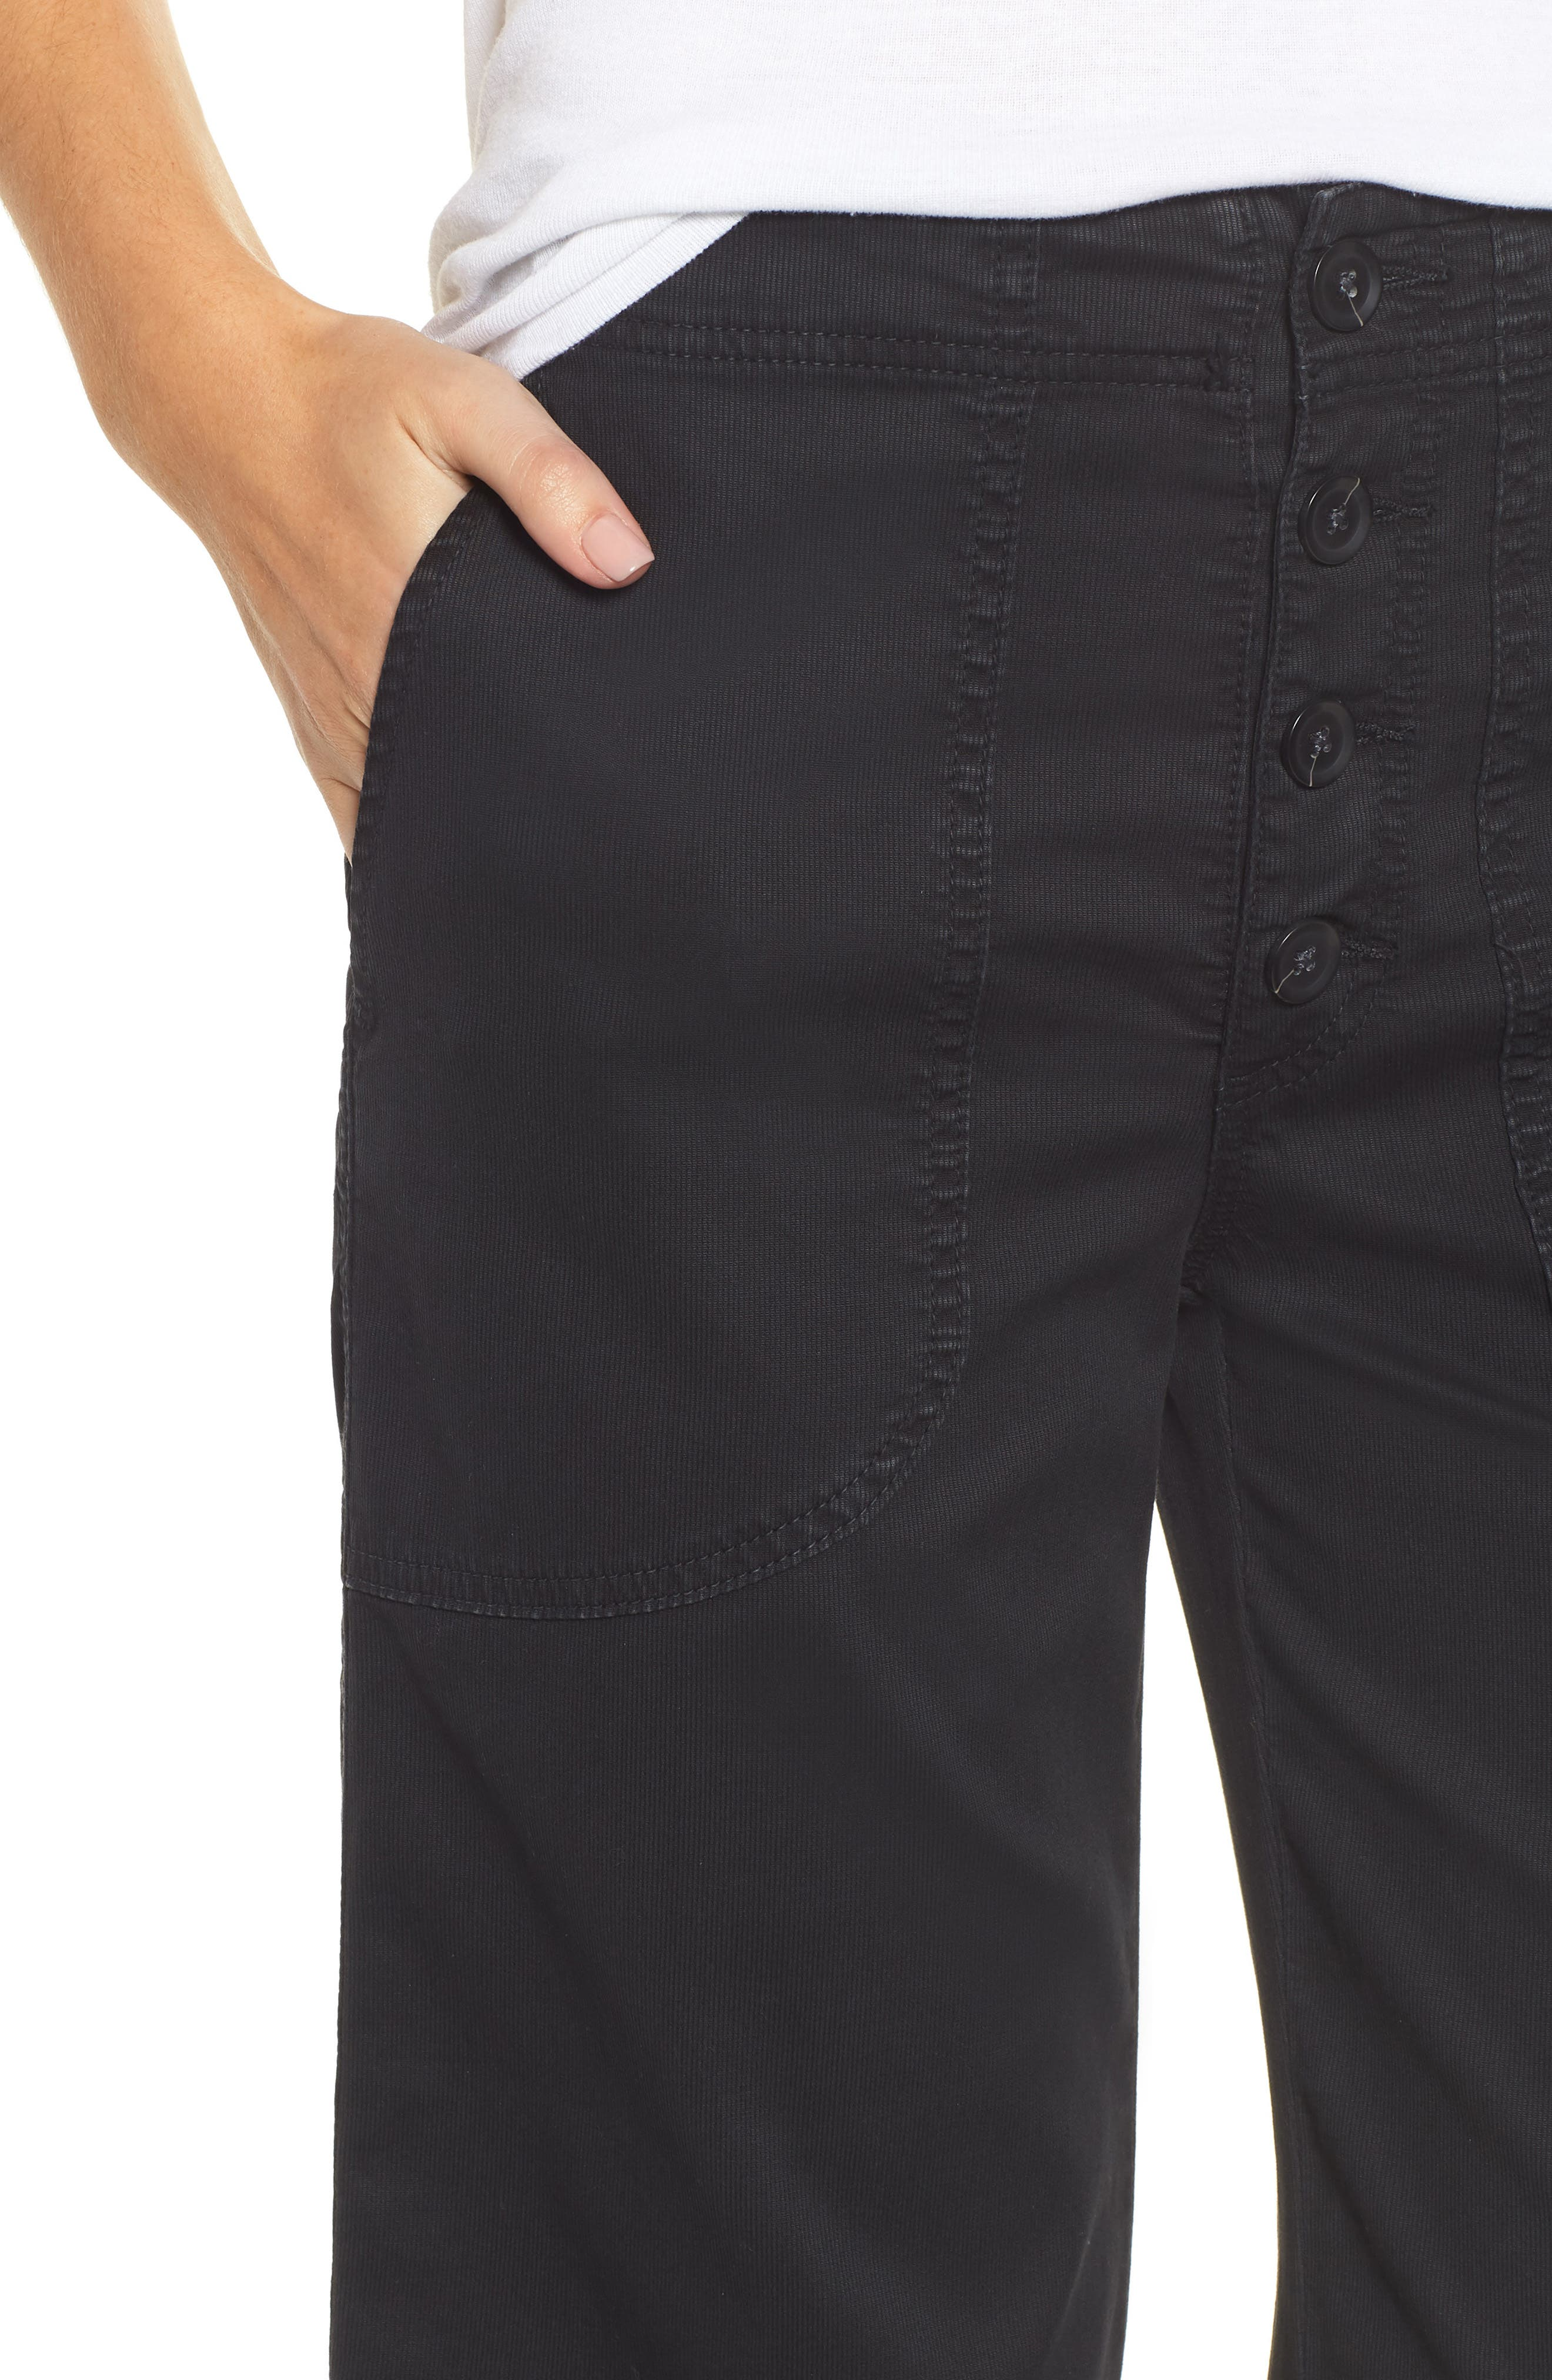 Etta High Waist Crop Wide Leg Jeans,                             Alternate thumbnail 4, color,                             SULFUR SUPER BLACK